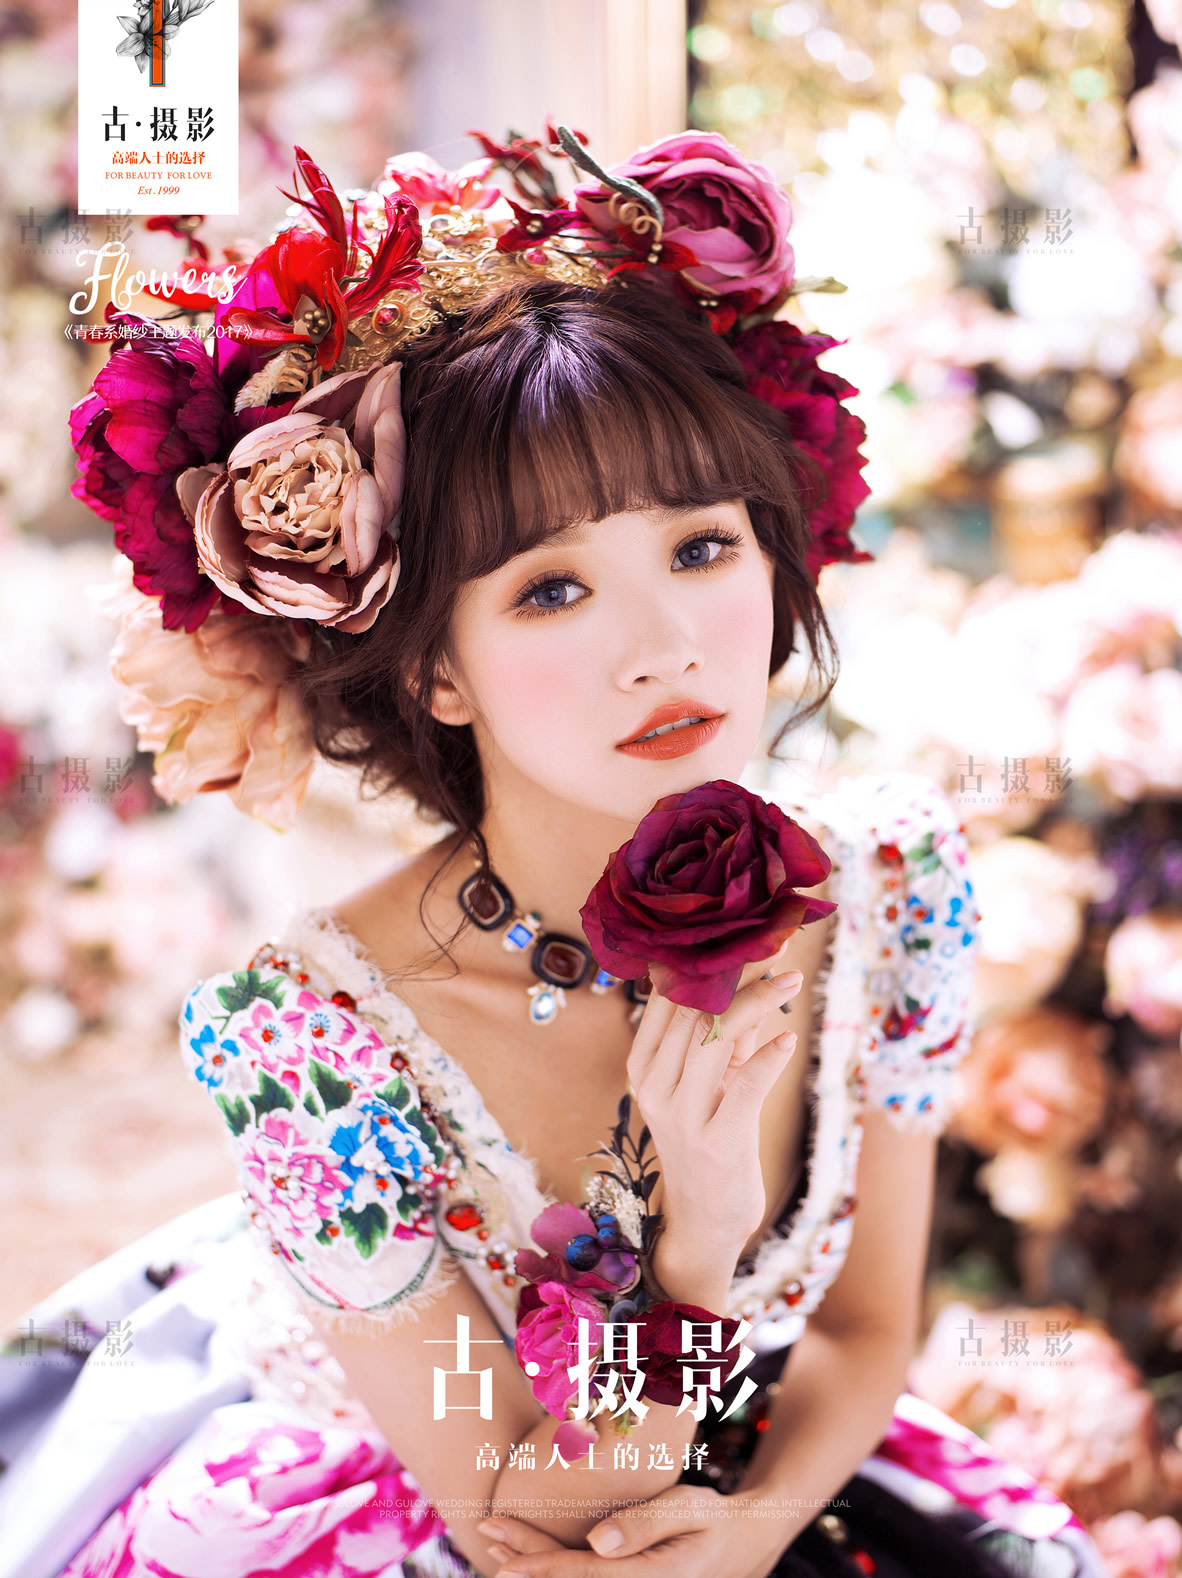 flowers - 明星范 - love昆明古摄影-昆明婚纱摄影网